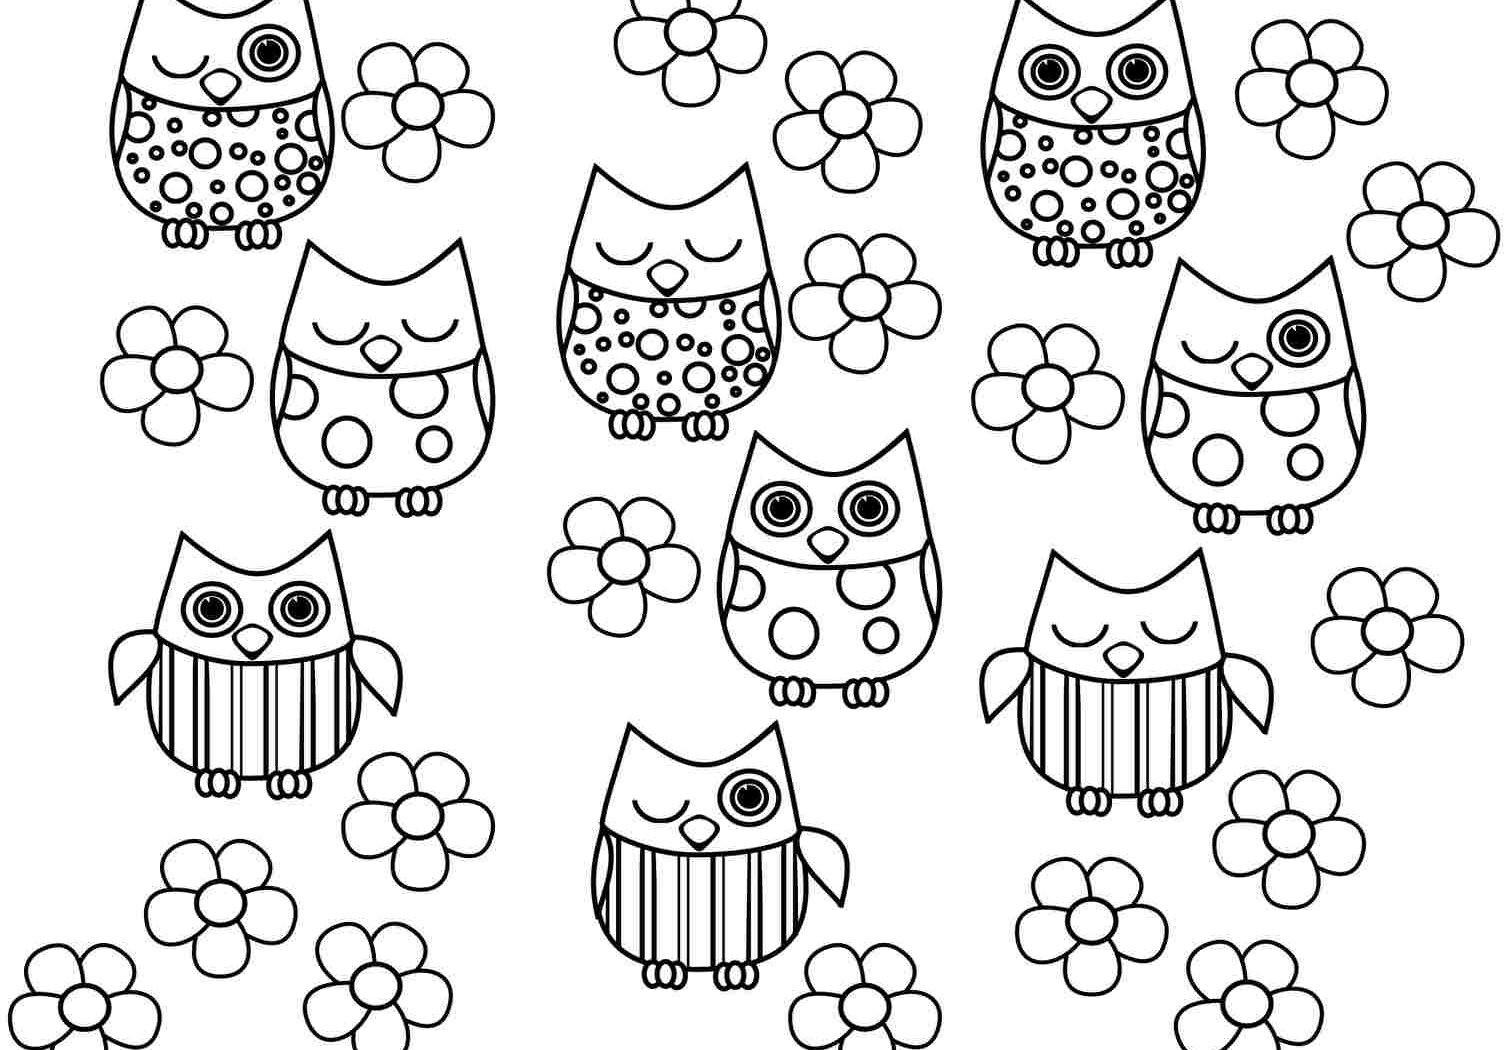 white owl vase of printable hard coloring pages elegant cool vases flower vase with printable hard coloring pages luxury draw cute owl coloring pages to print free printable animals hard